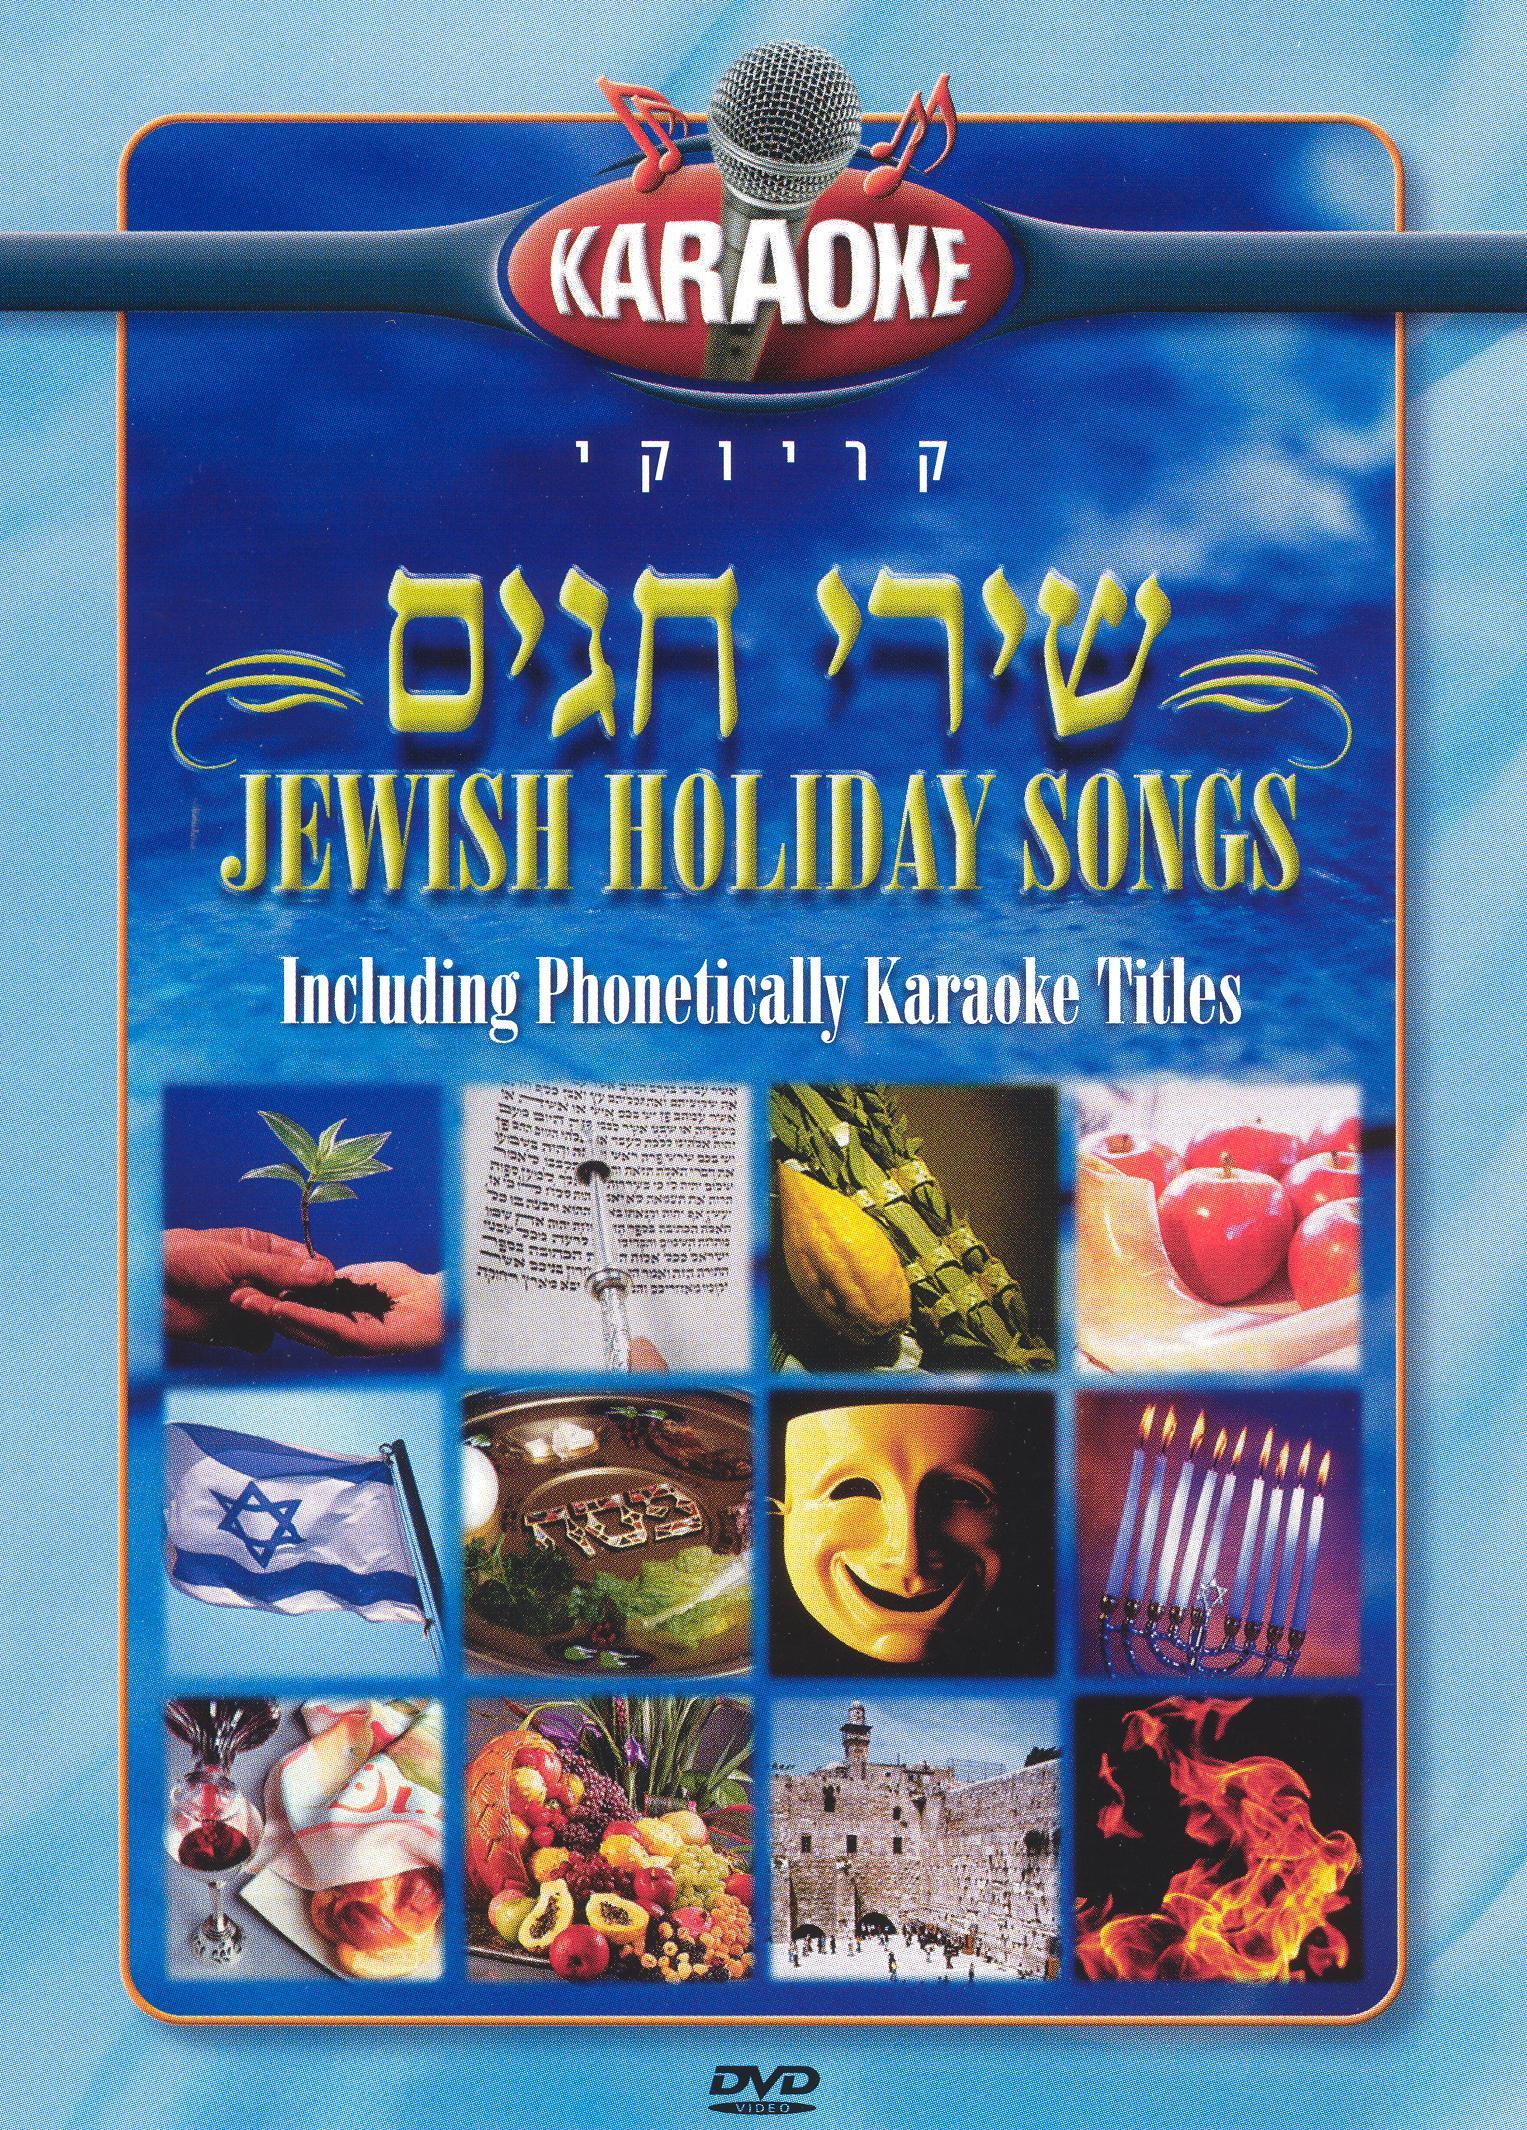 Karaoke: Jewish Holiday Songs